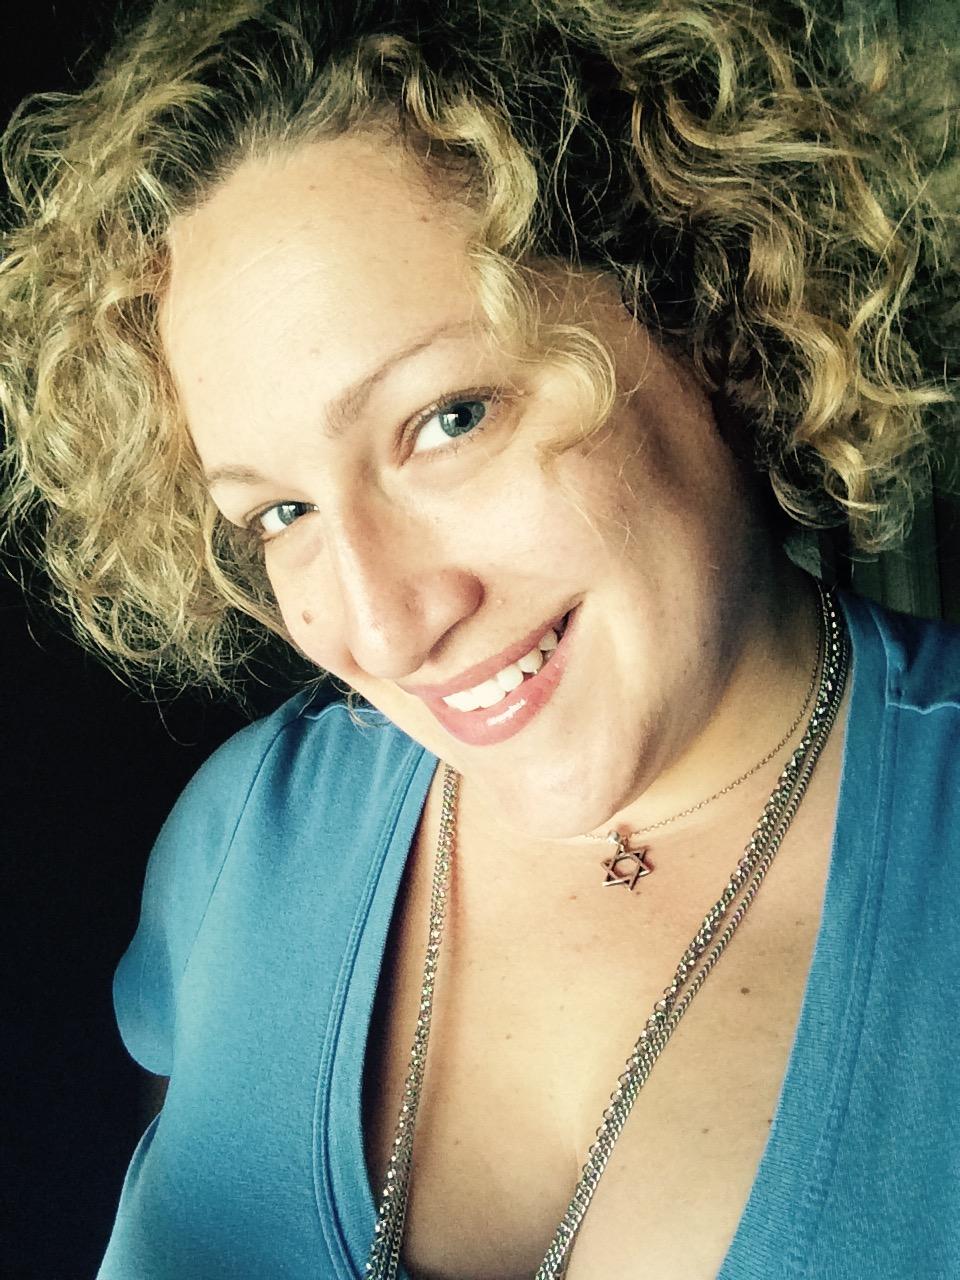 Marcy Lambert-Pellegrino, Founder and Creative Director of Sassi Inc. Creative Agency